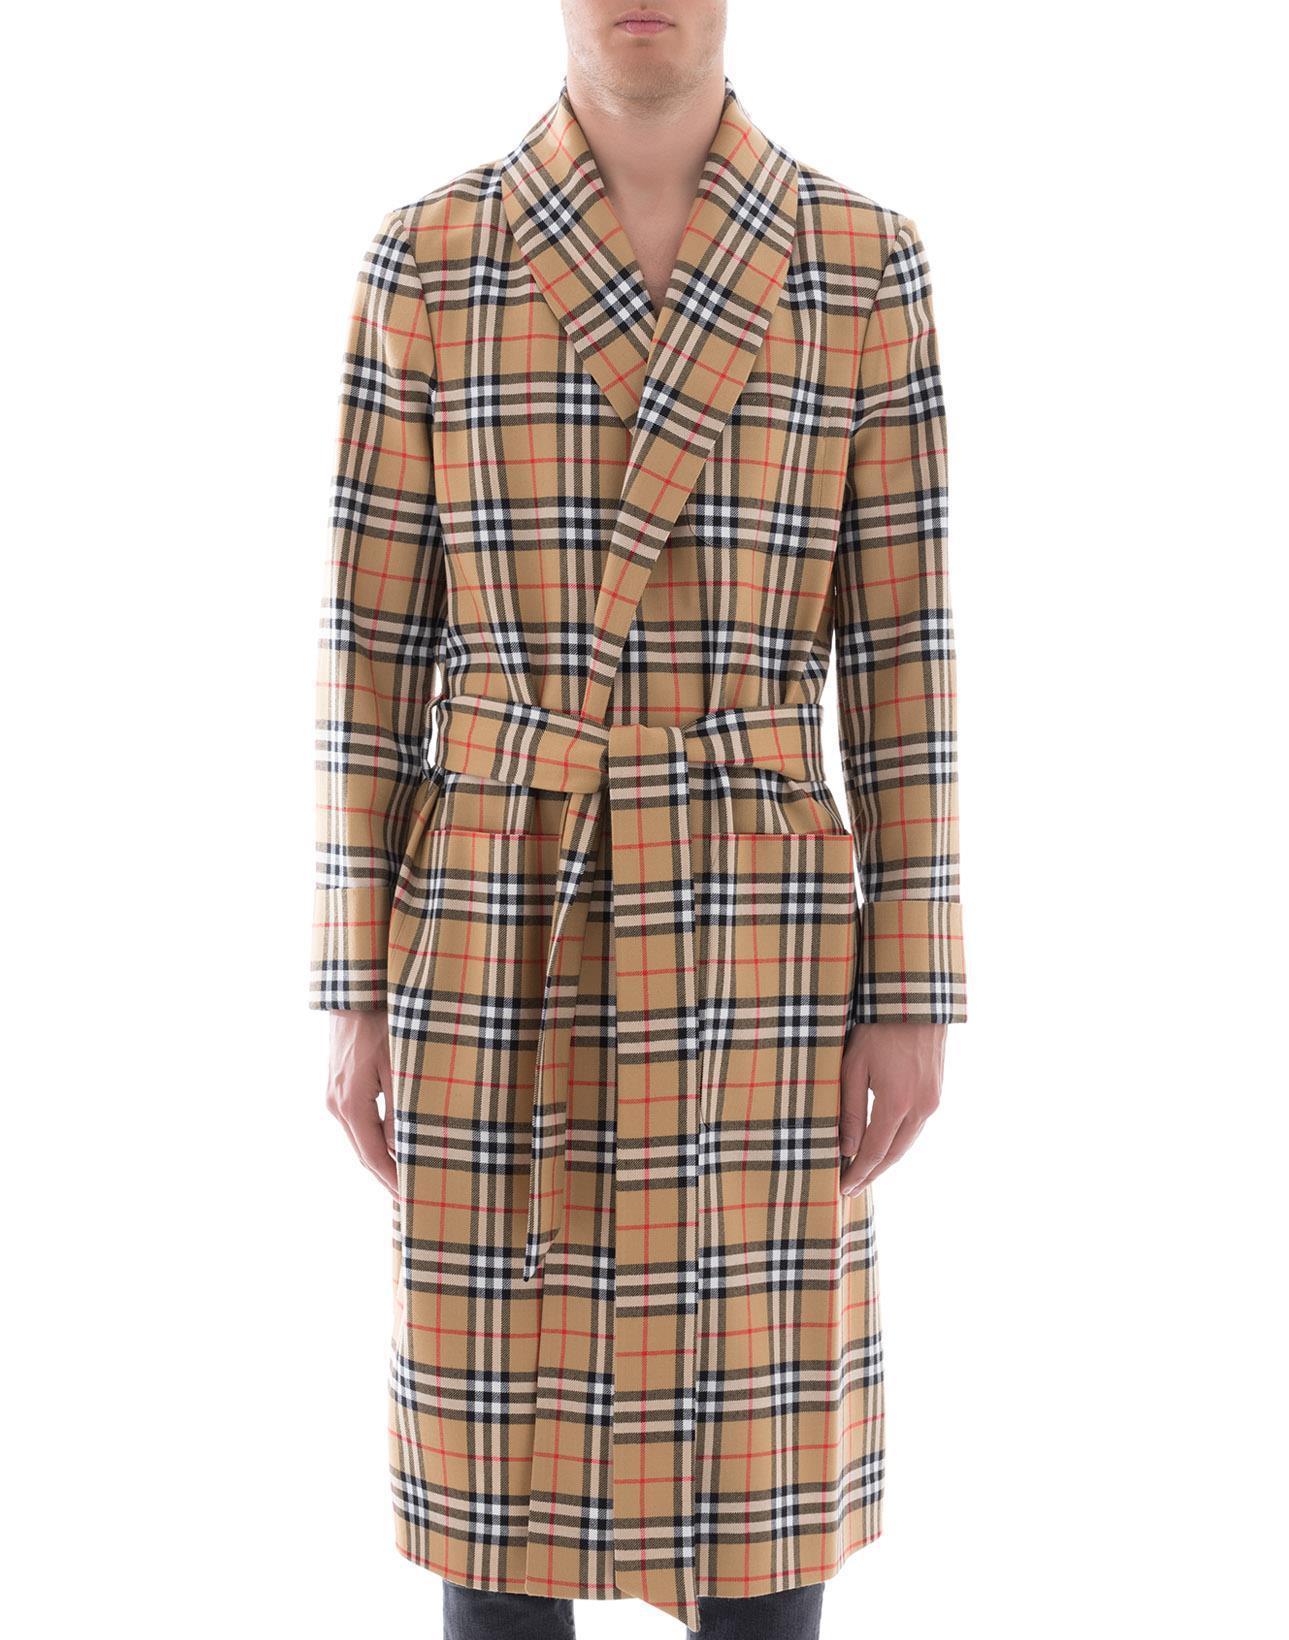 d8e70533d116 switzerland burberry manston check silk tie b5175 b4d5c; coupon order  burberry check waist tie coat in natural for men lyst ce79c b66e1 30720  b7598